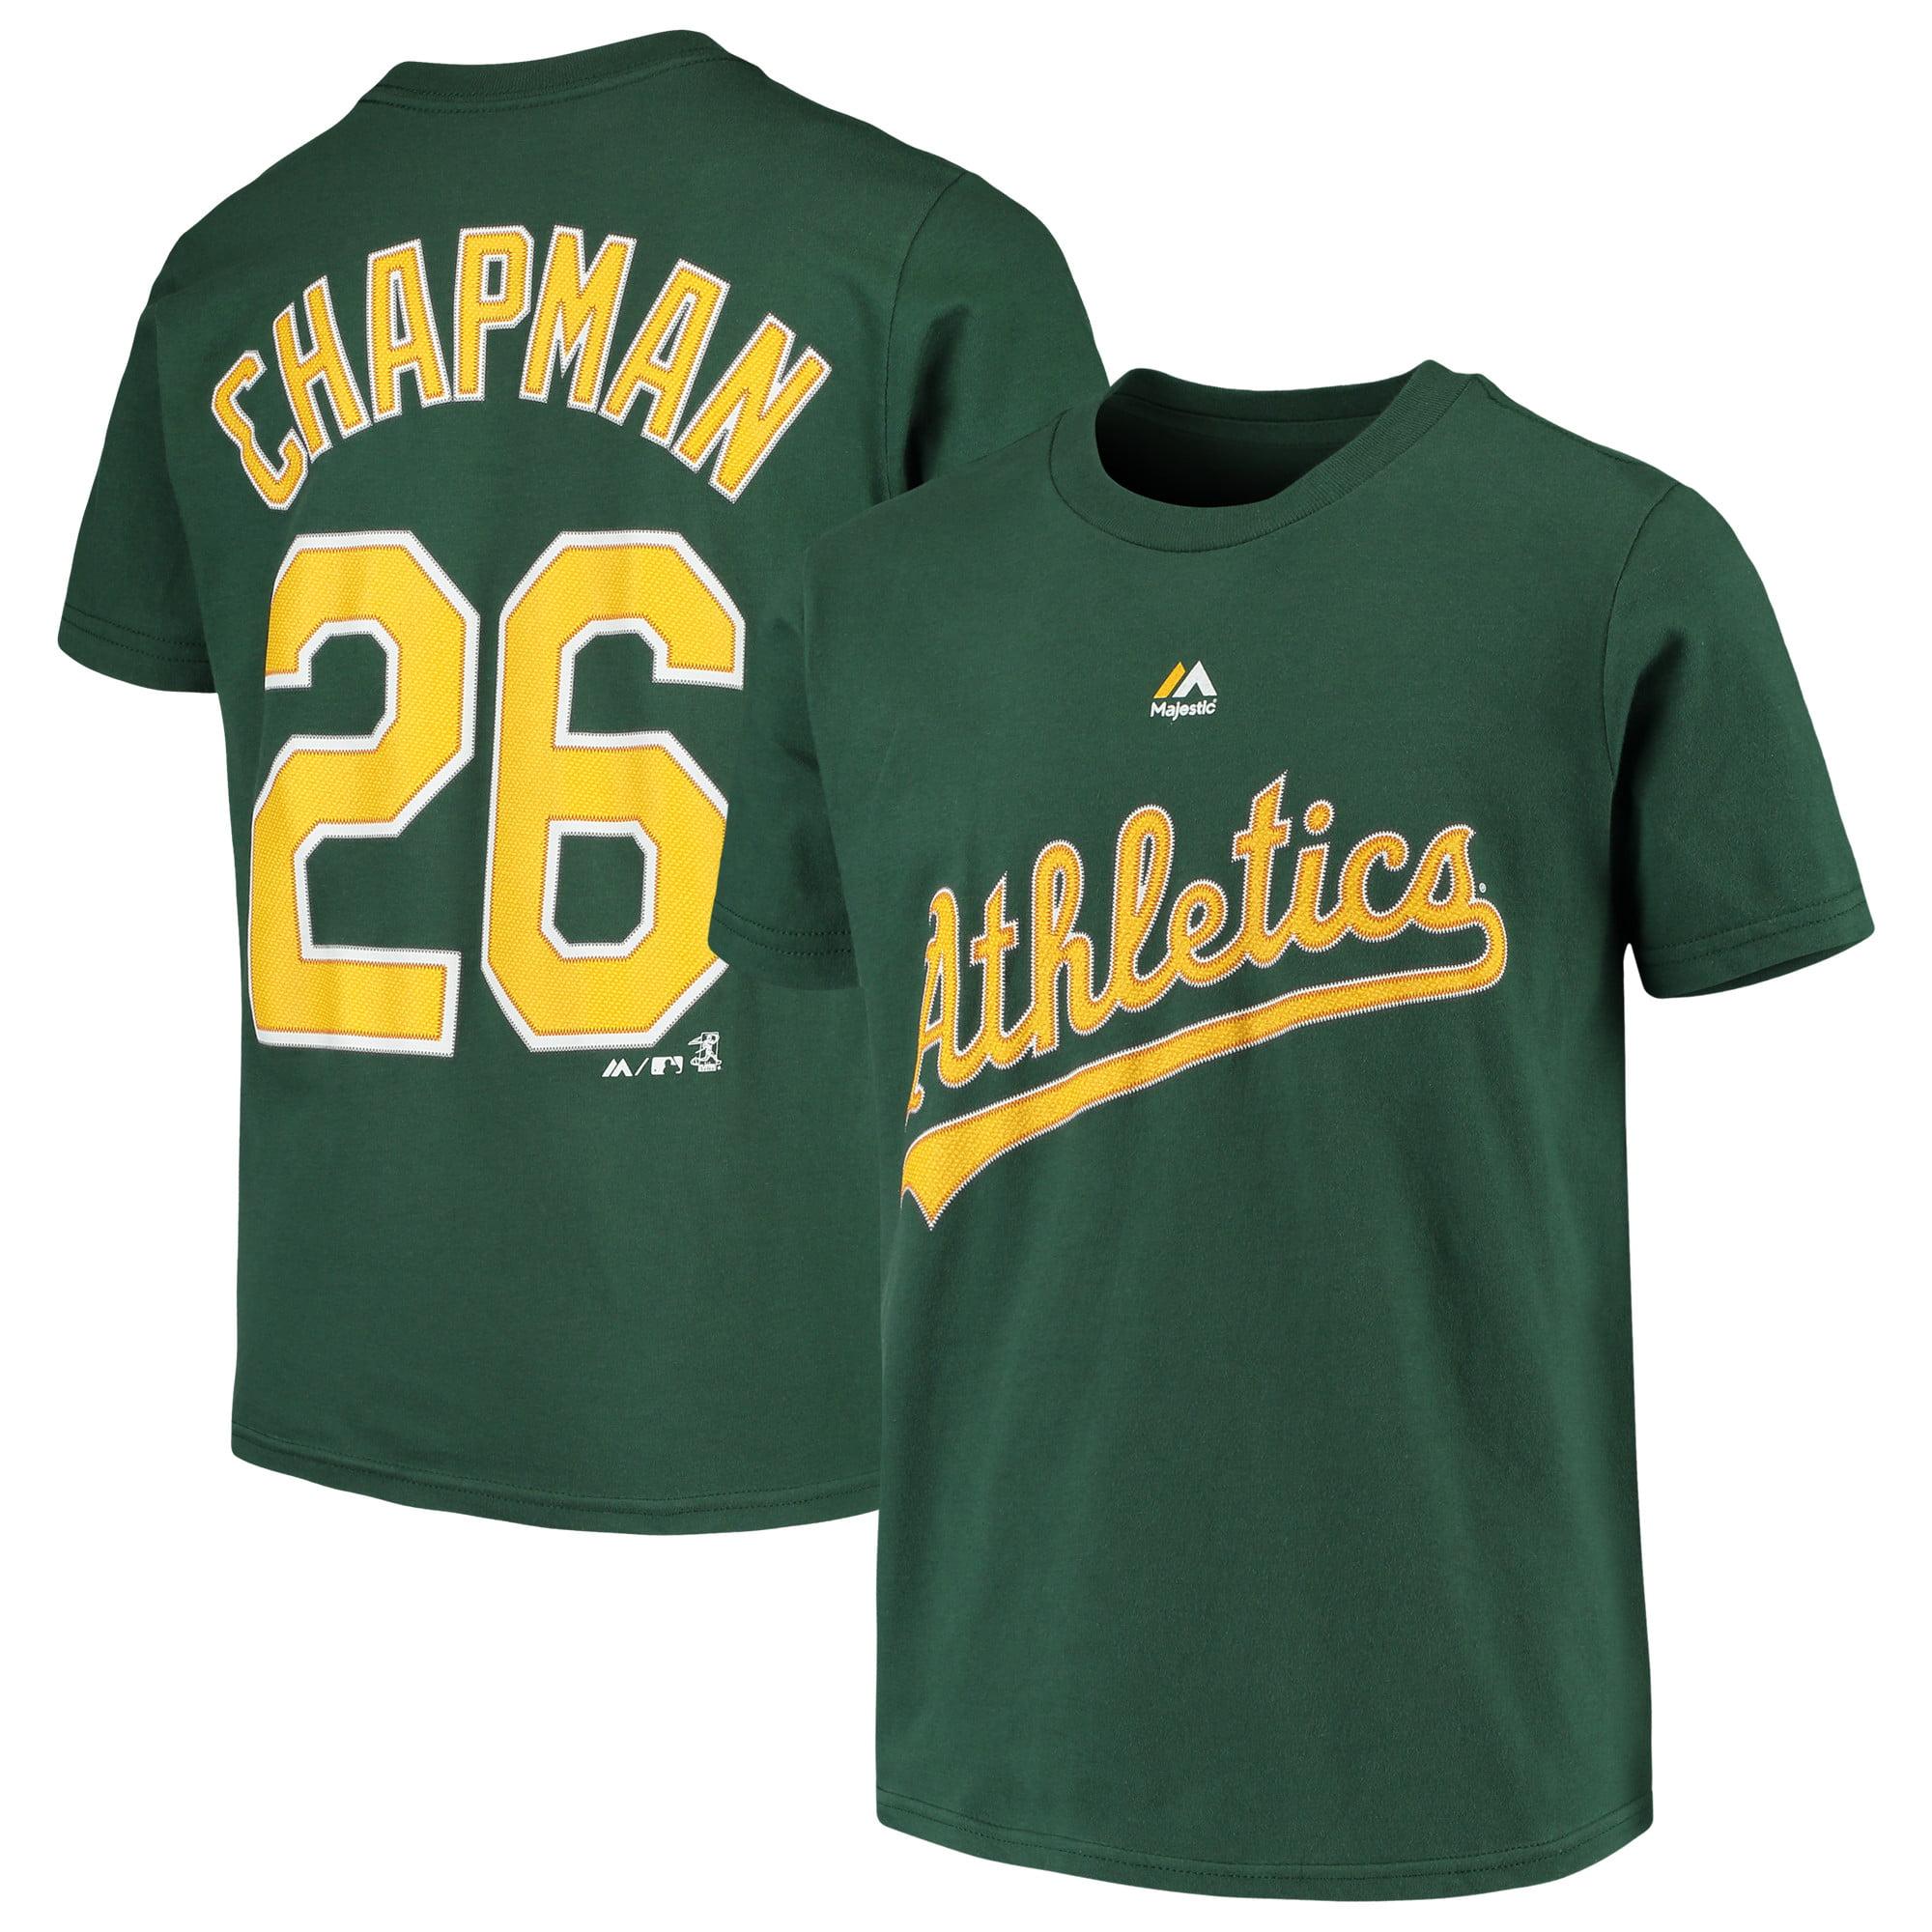 Matt Chapman Oakland Athletics Majestic Youth Name & Number T-Shirt - Green